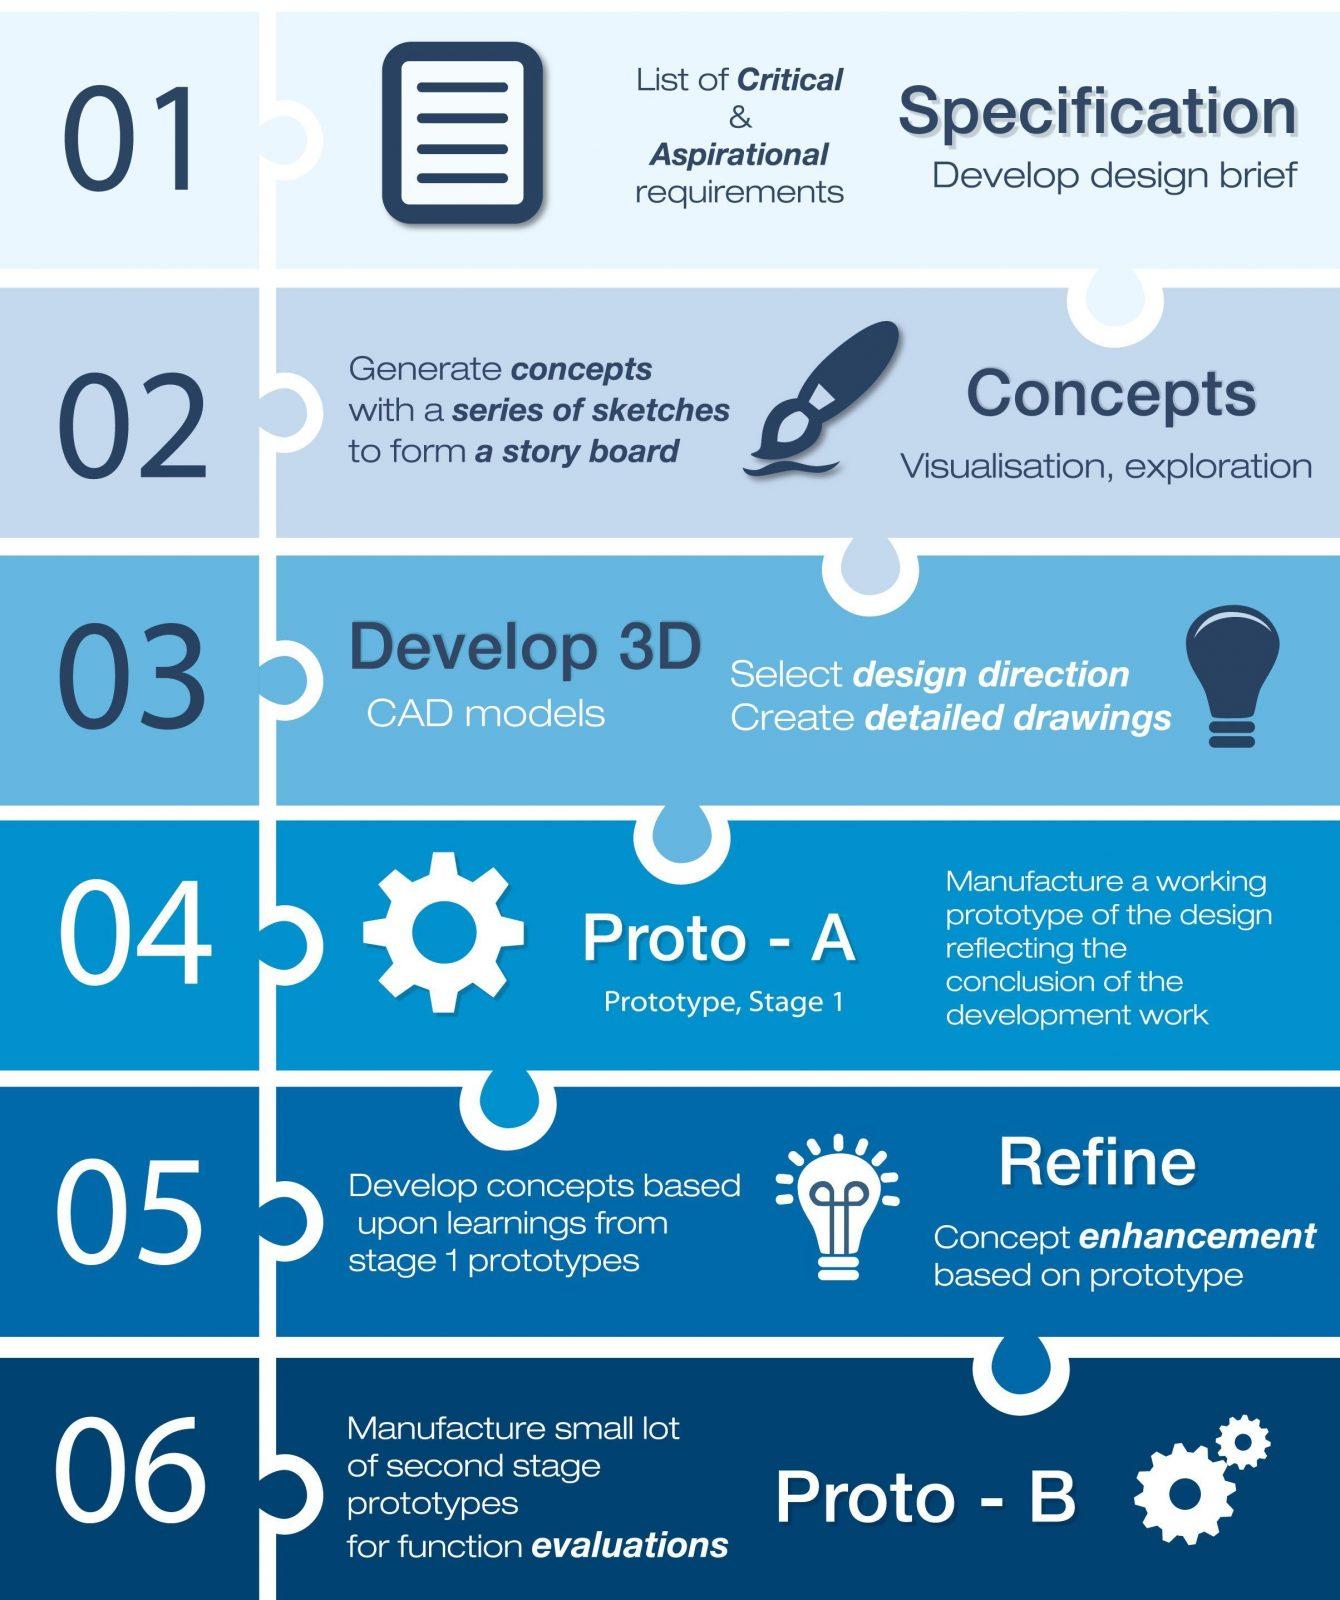 Arrotek's Six-Step Medical Device Product Design Process